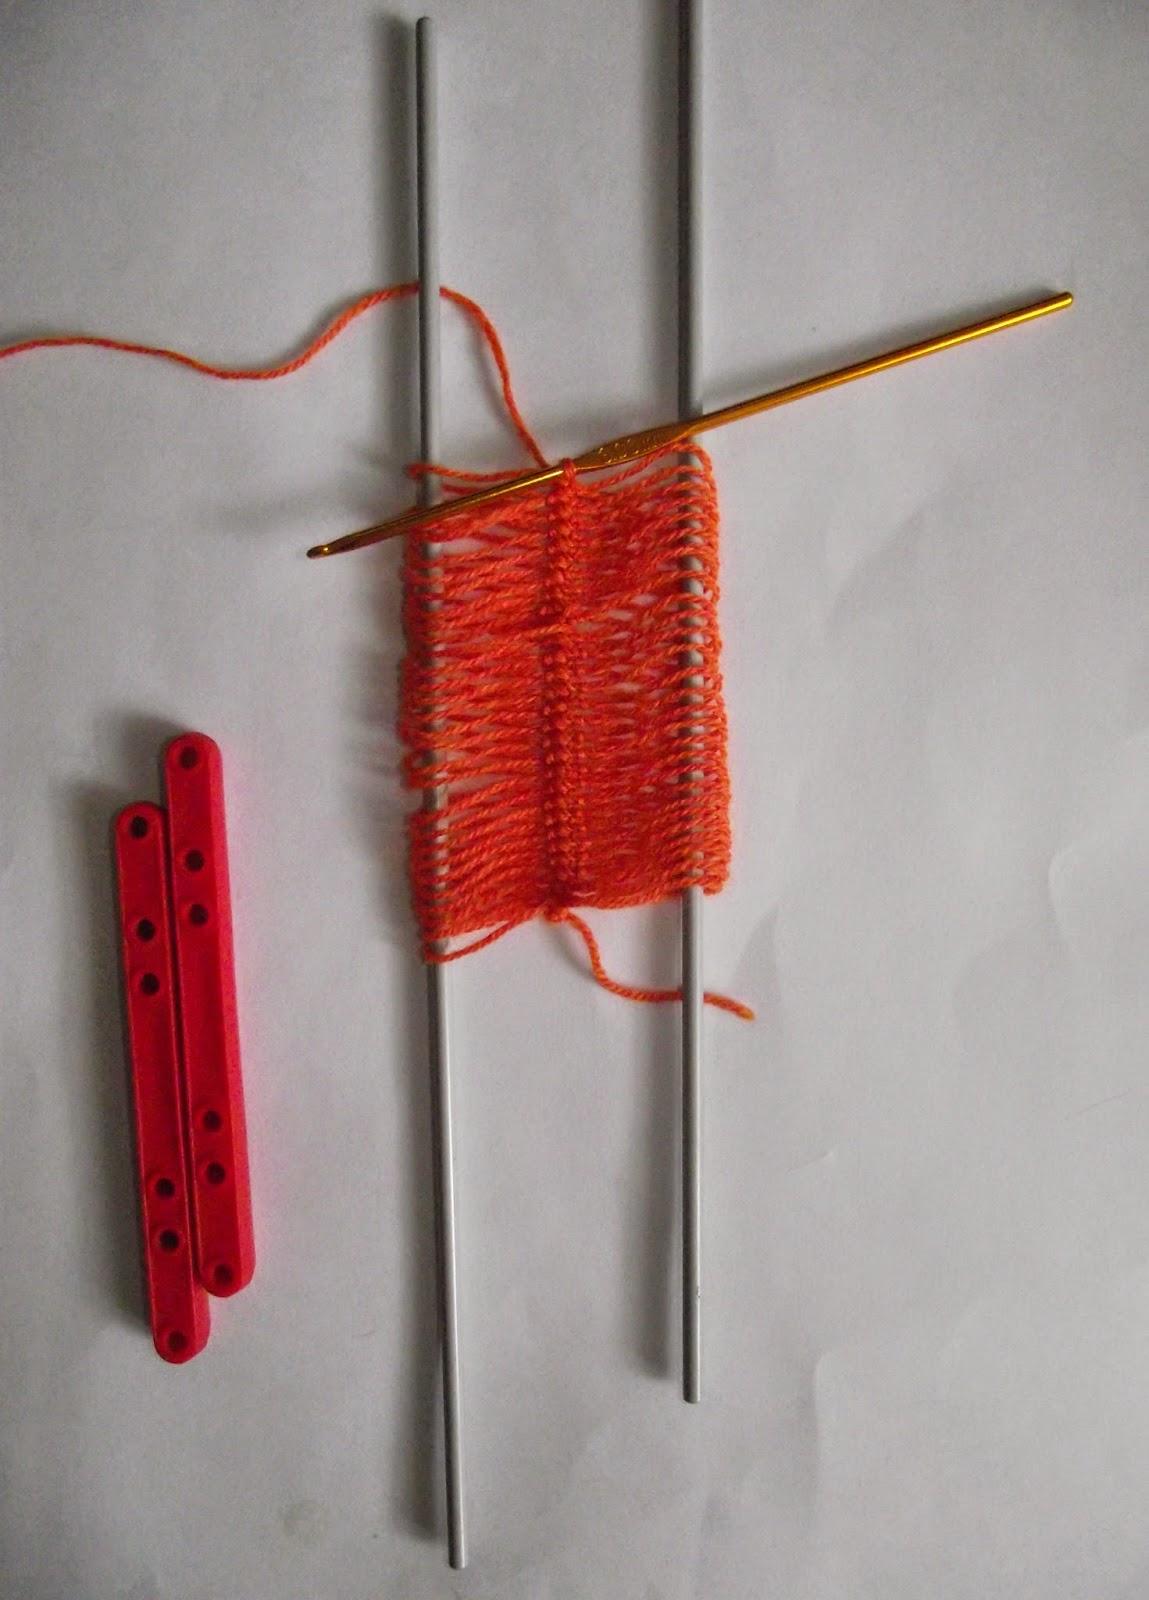 Другие виды рукоделия. Вязание на вилке 48